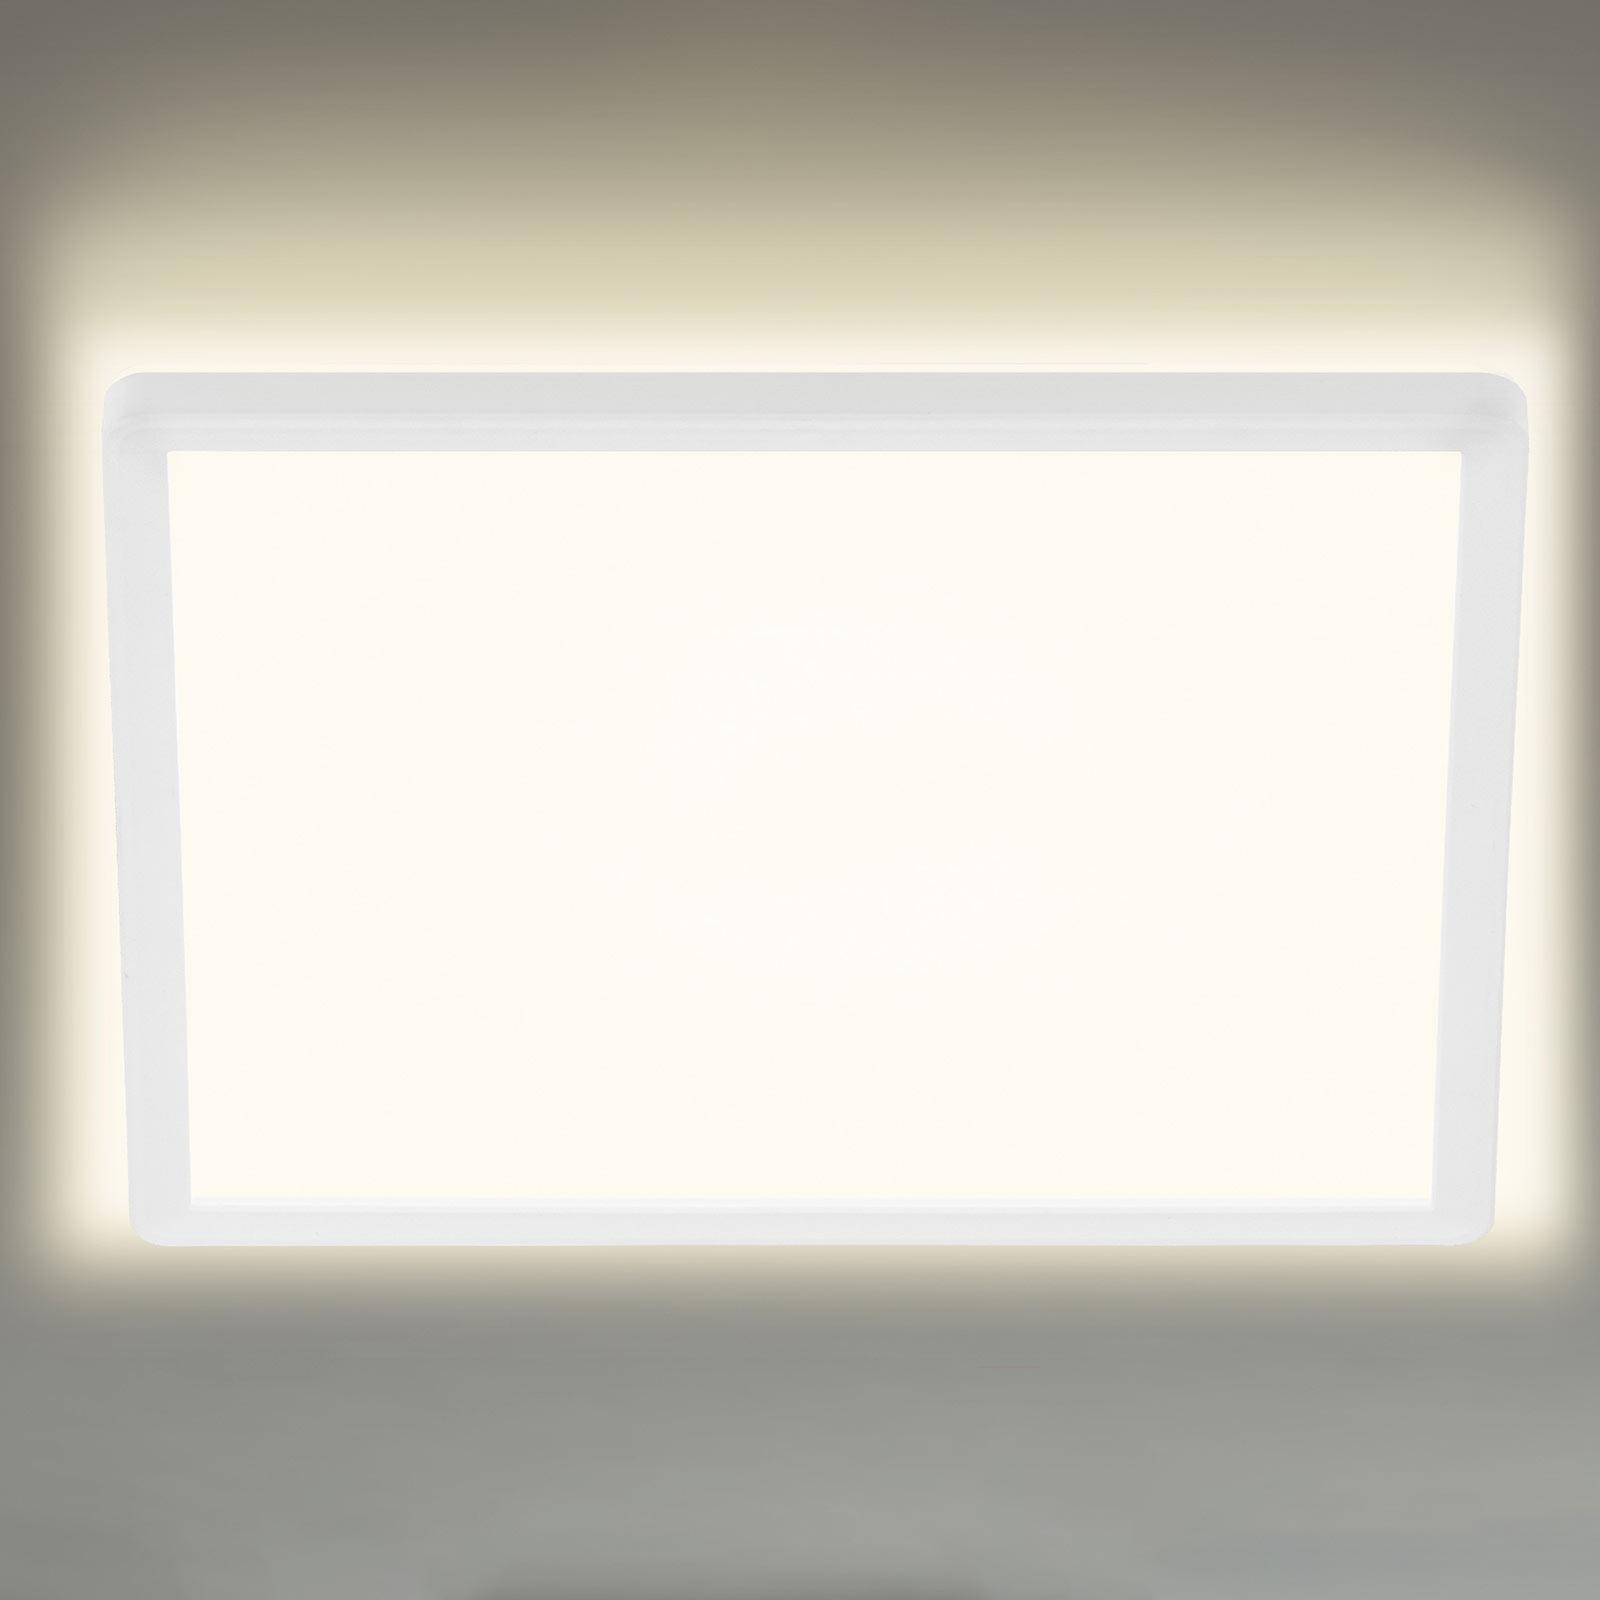 Lampa sufitowa LED 7156/7158, kątowa 42x42cm